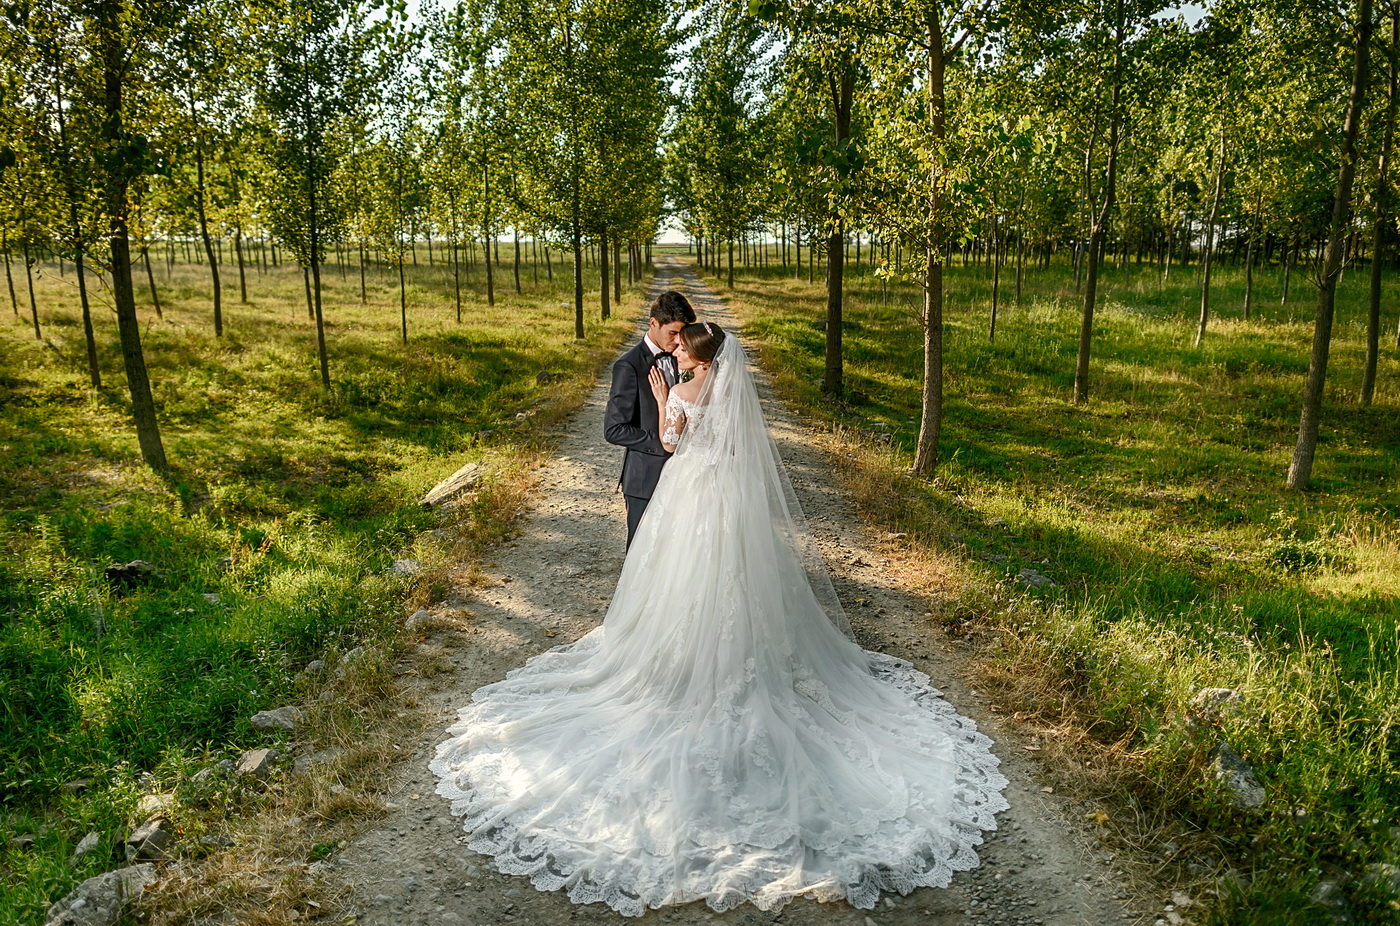 Destination Wedding Photographer_Marian Sterea_055.jpg